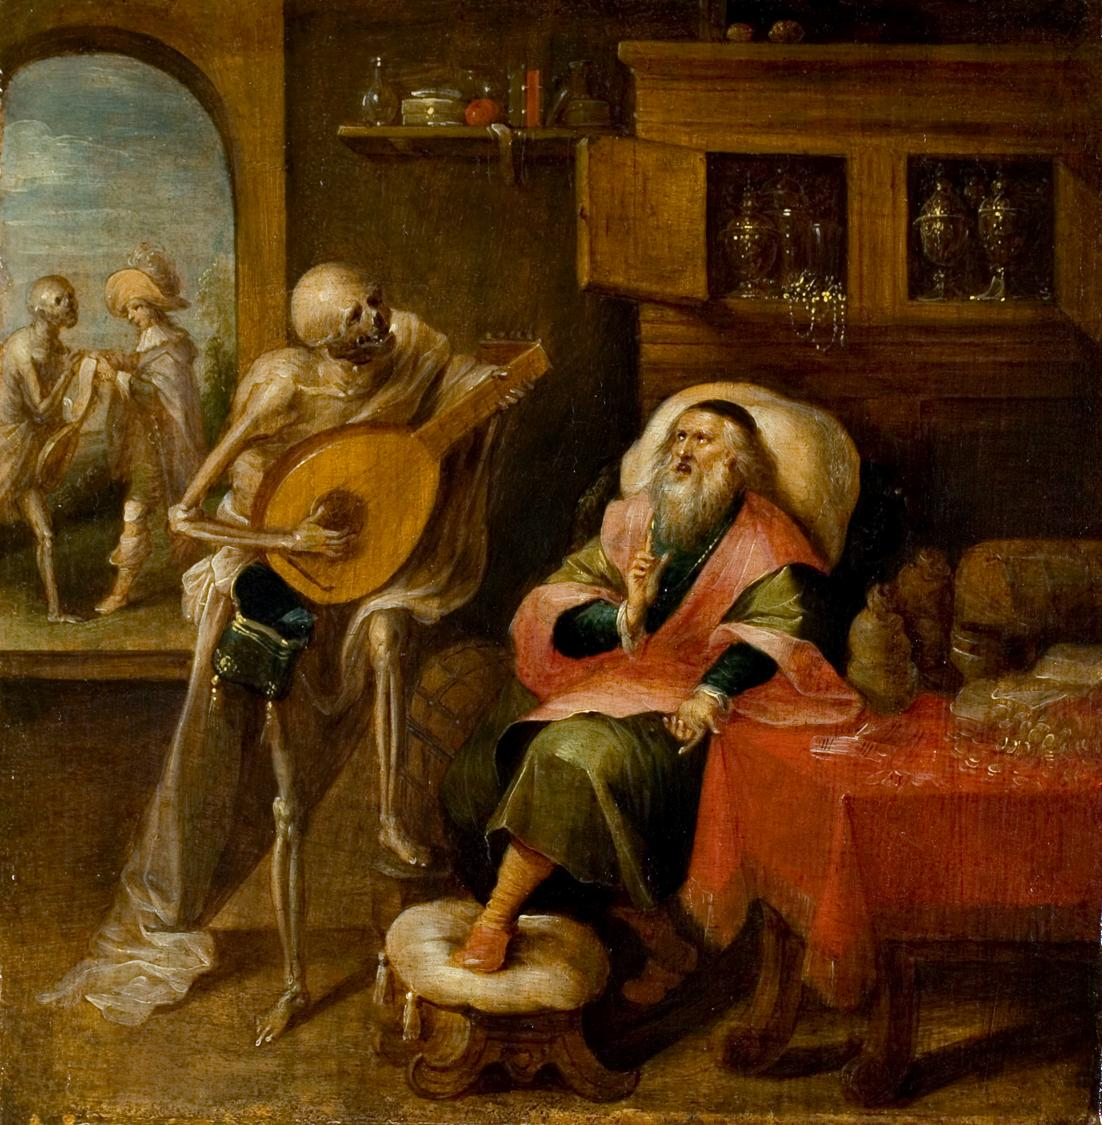 345Death_and_the_Miser_(c.17th_century)._Frans_Fracken_II_(Flemish,_1581-1642).jpg